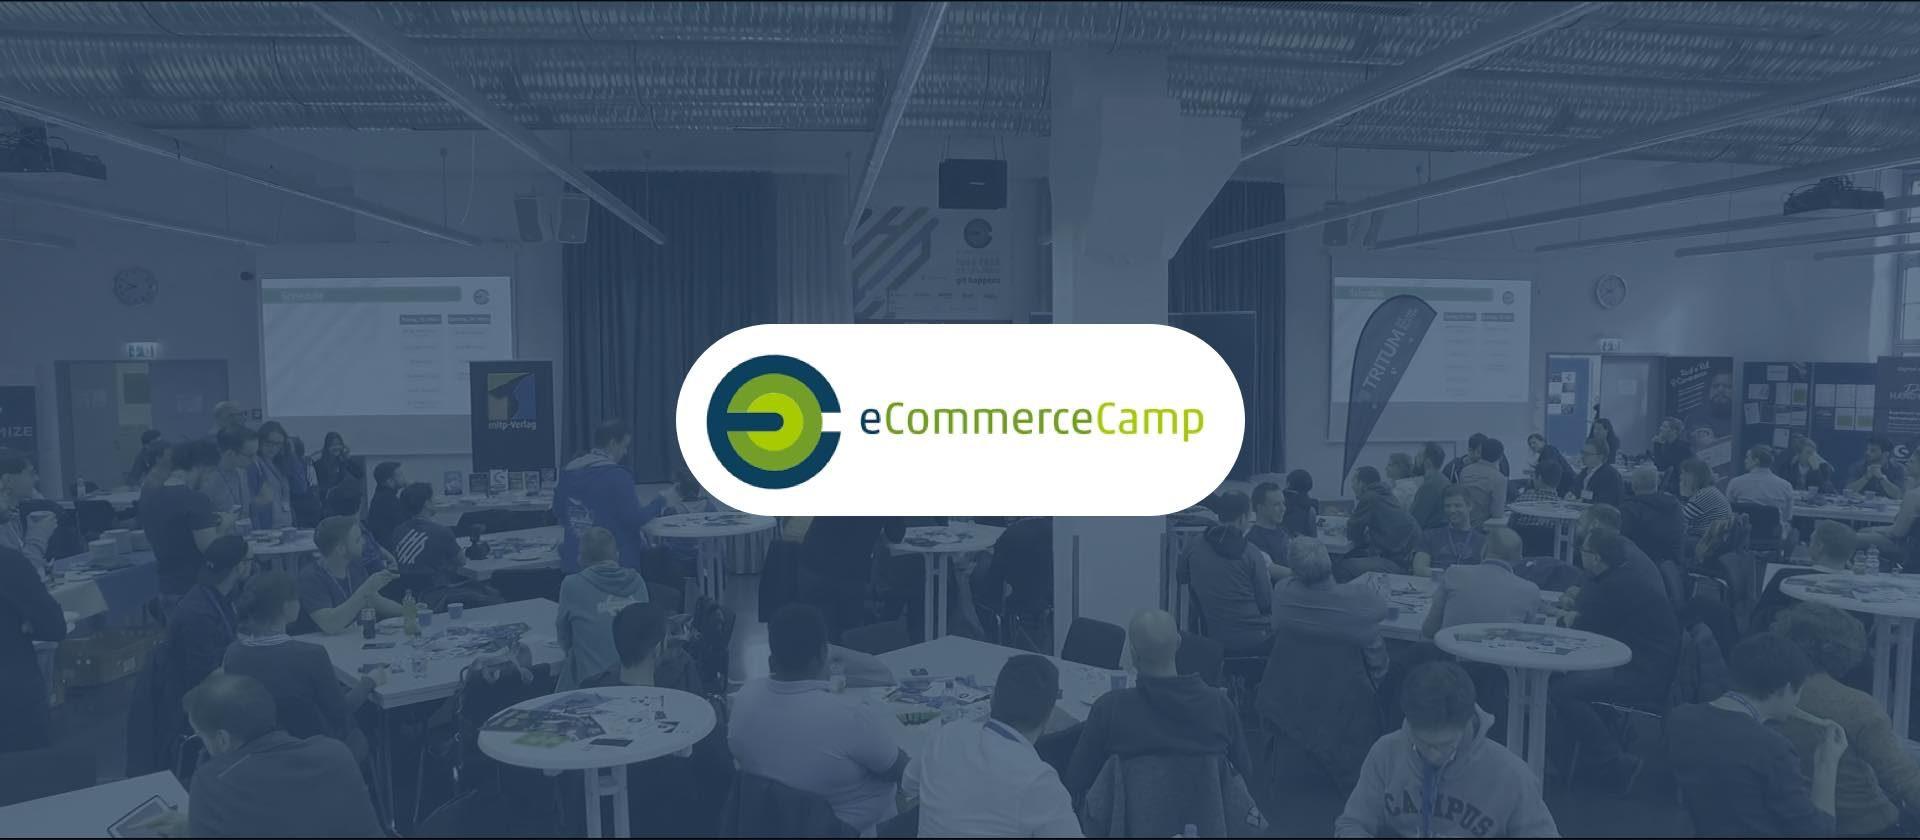 eCommerceCamp 2019: Ecommerce and Digitalization